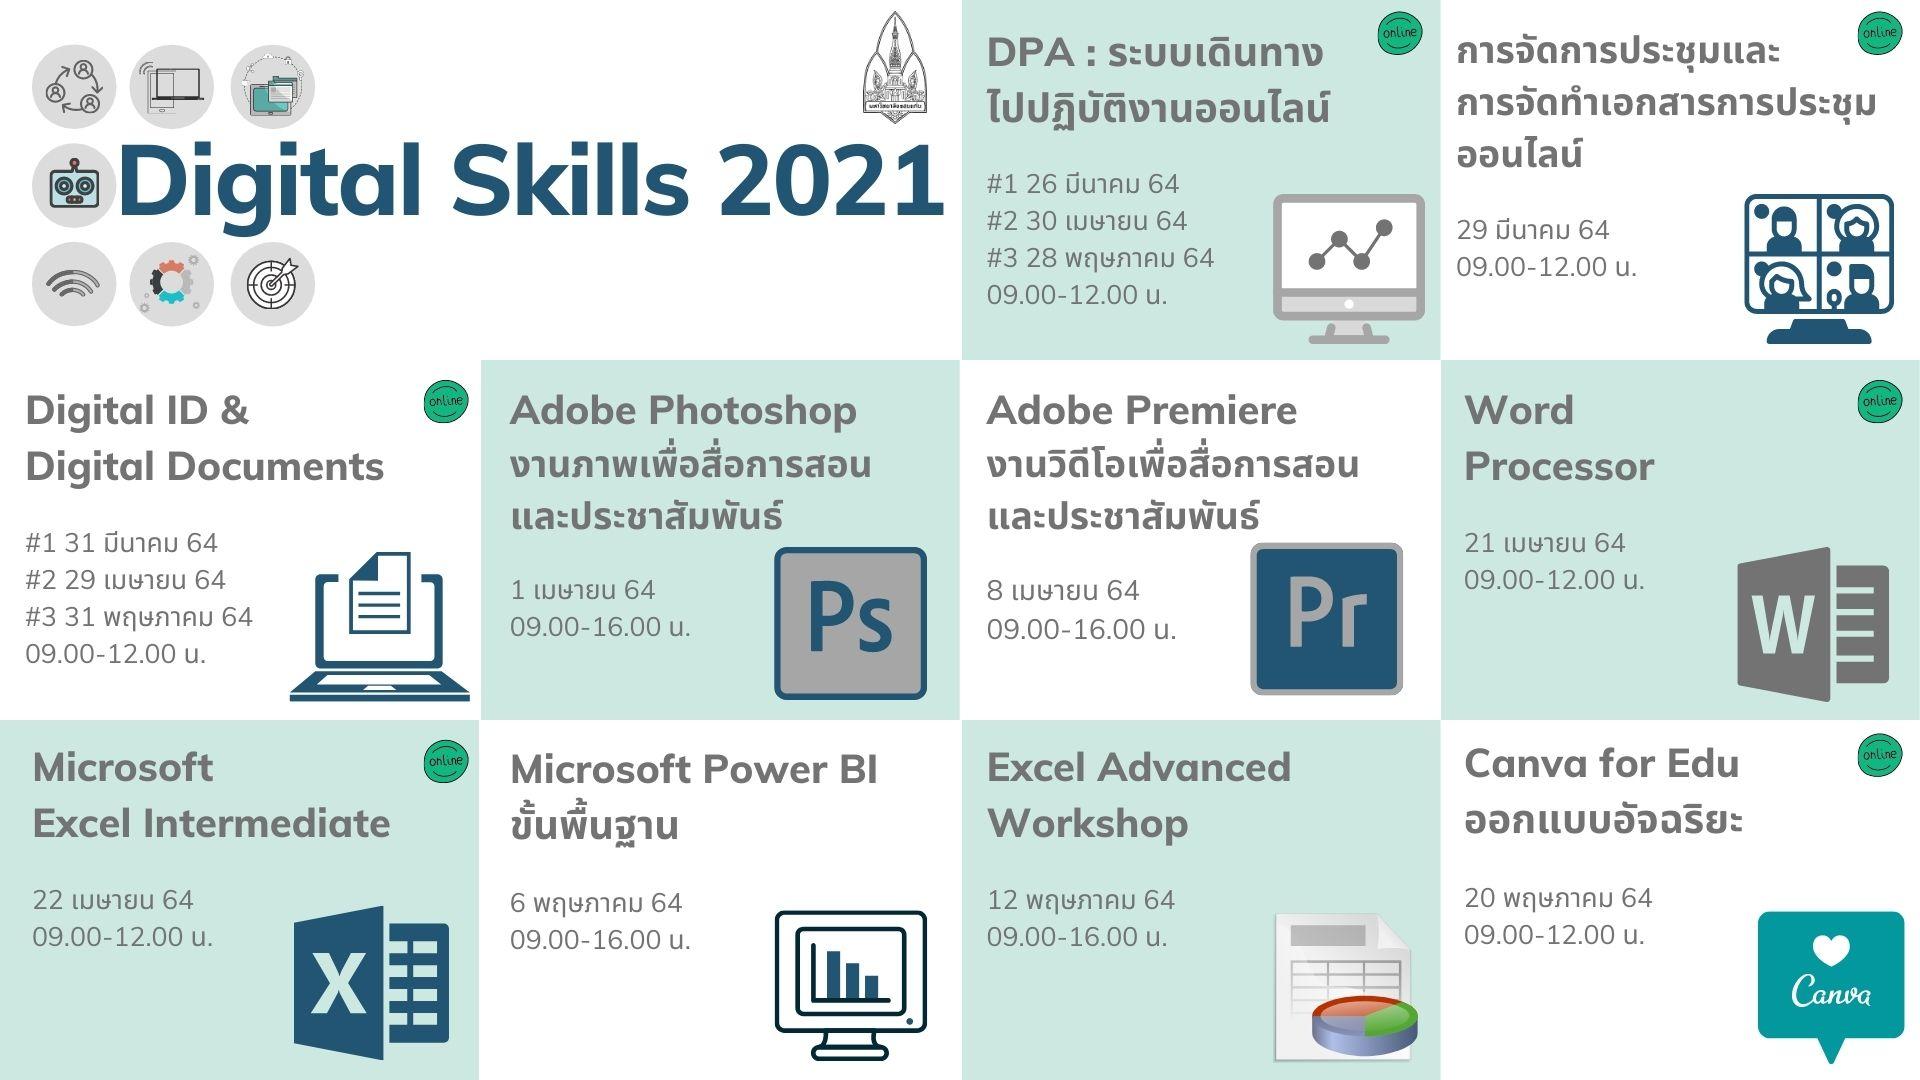 Digital Skills 2021